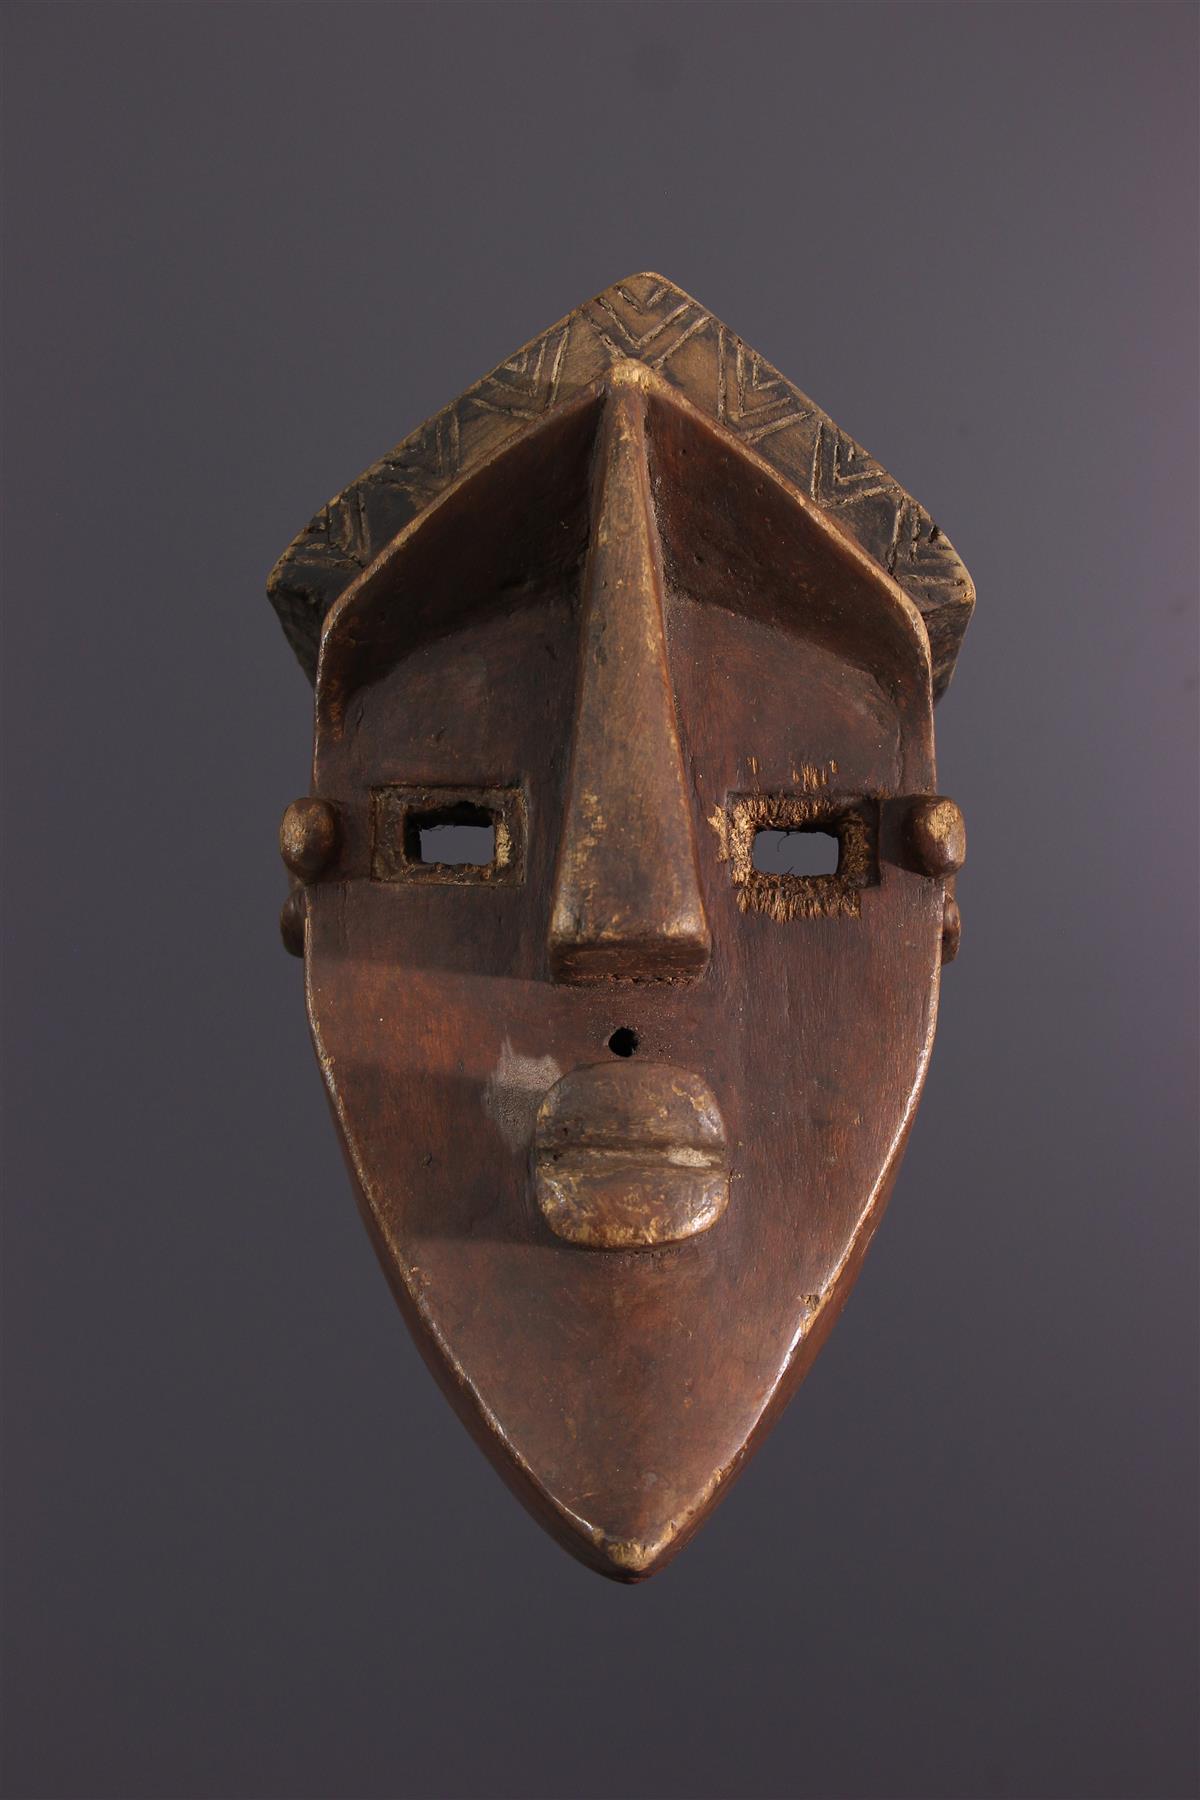 Lwalwa Mask - Tribal art